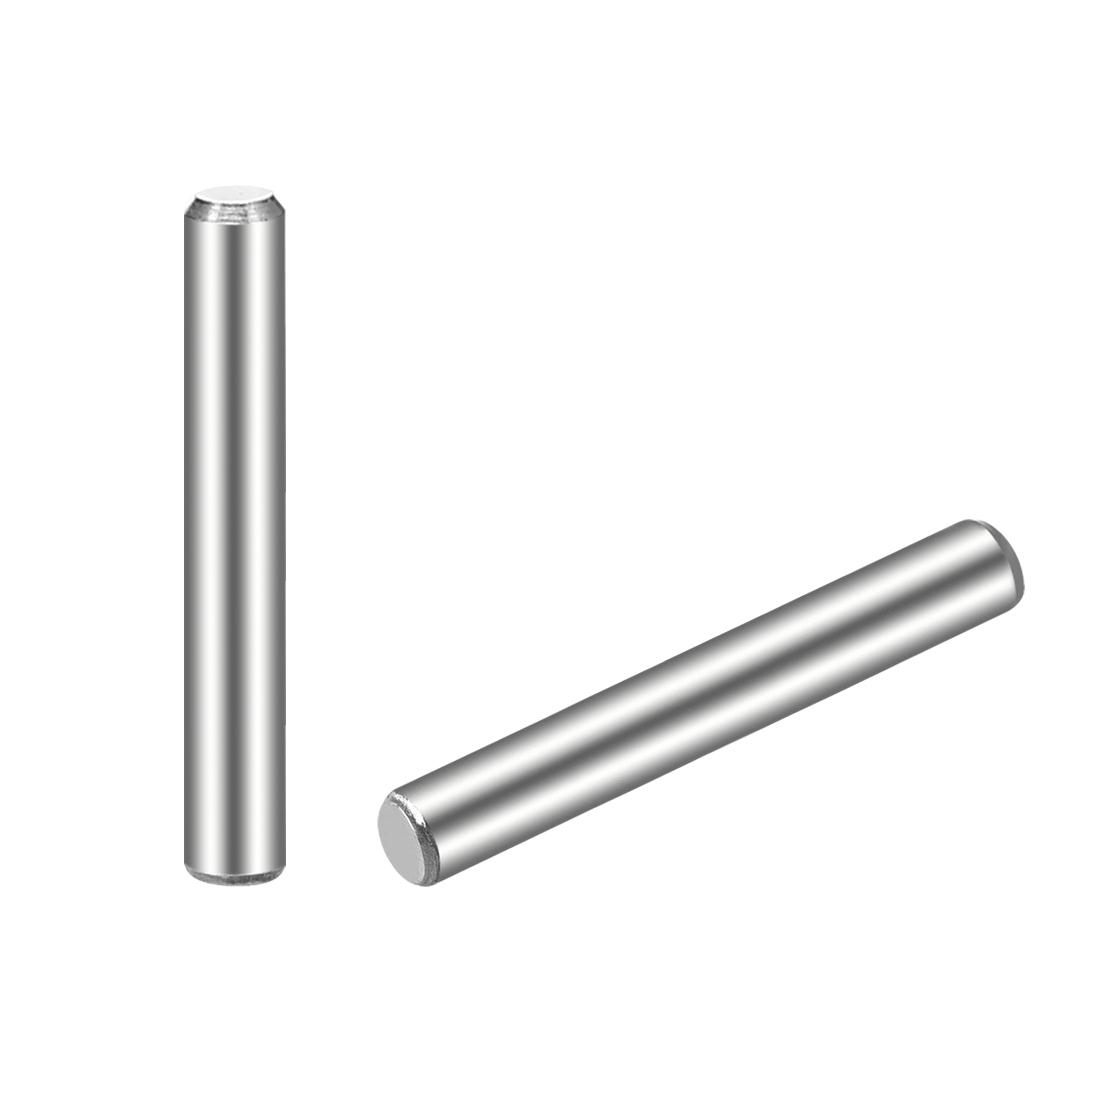 25Pcs 3mm x 20mm Dowel Pin 304 Stainless Steel Shelf Support Pin Fasten